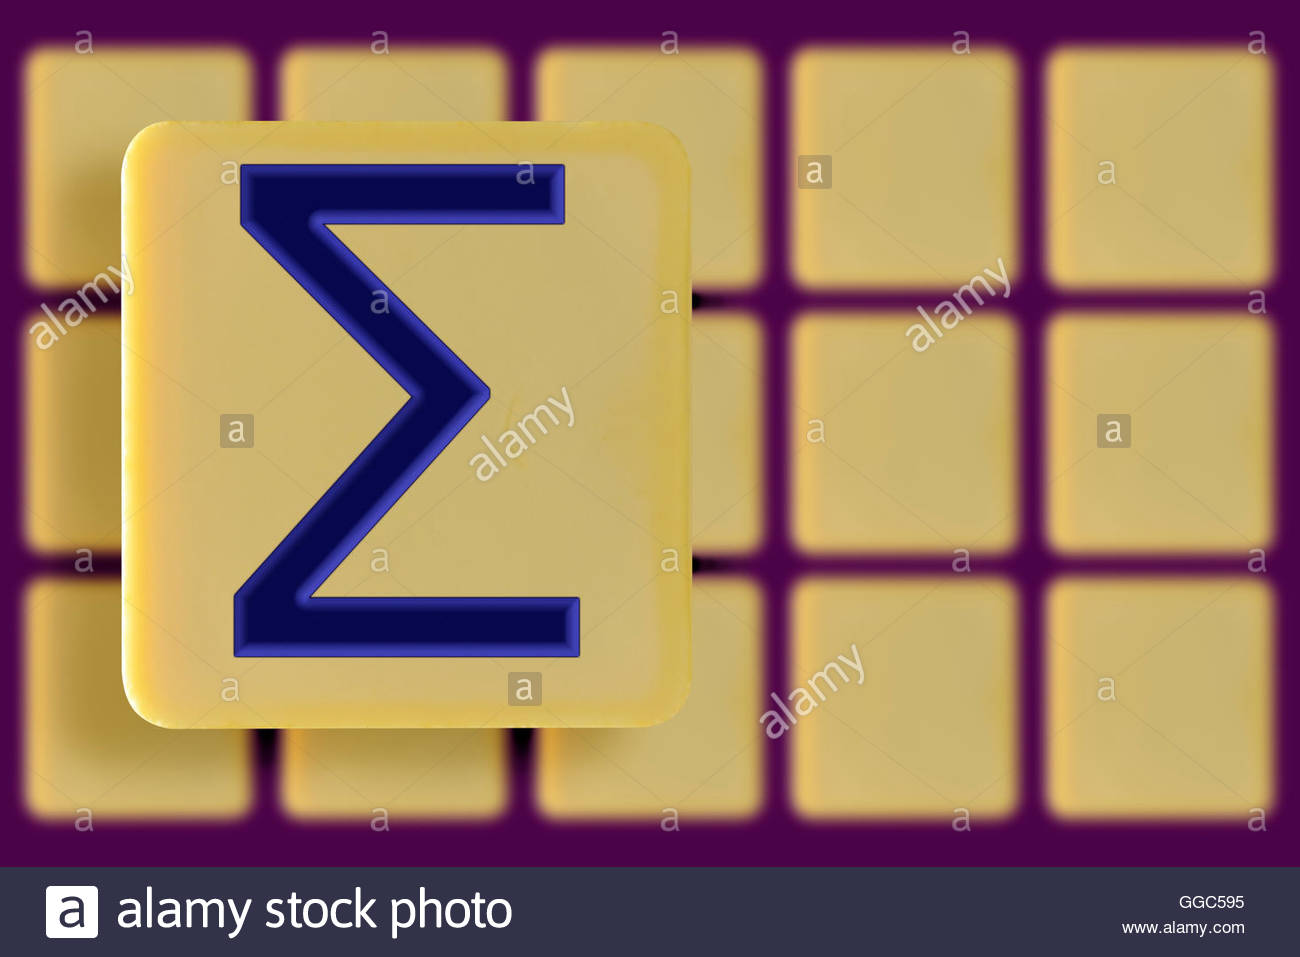 Sigma symbol on an alphabet tile dorset england britain uk sigma symbol on an alphabet tile dorset england britain uk biocorpaavc Images